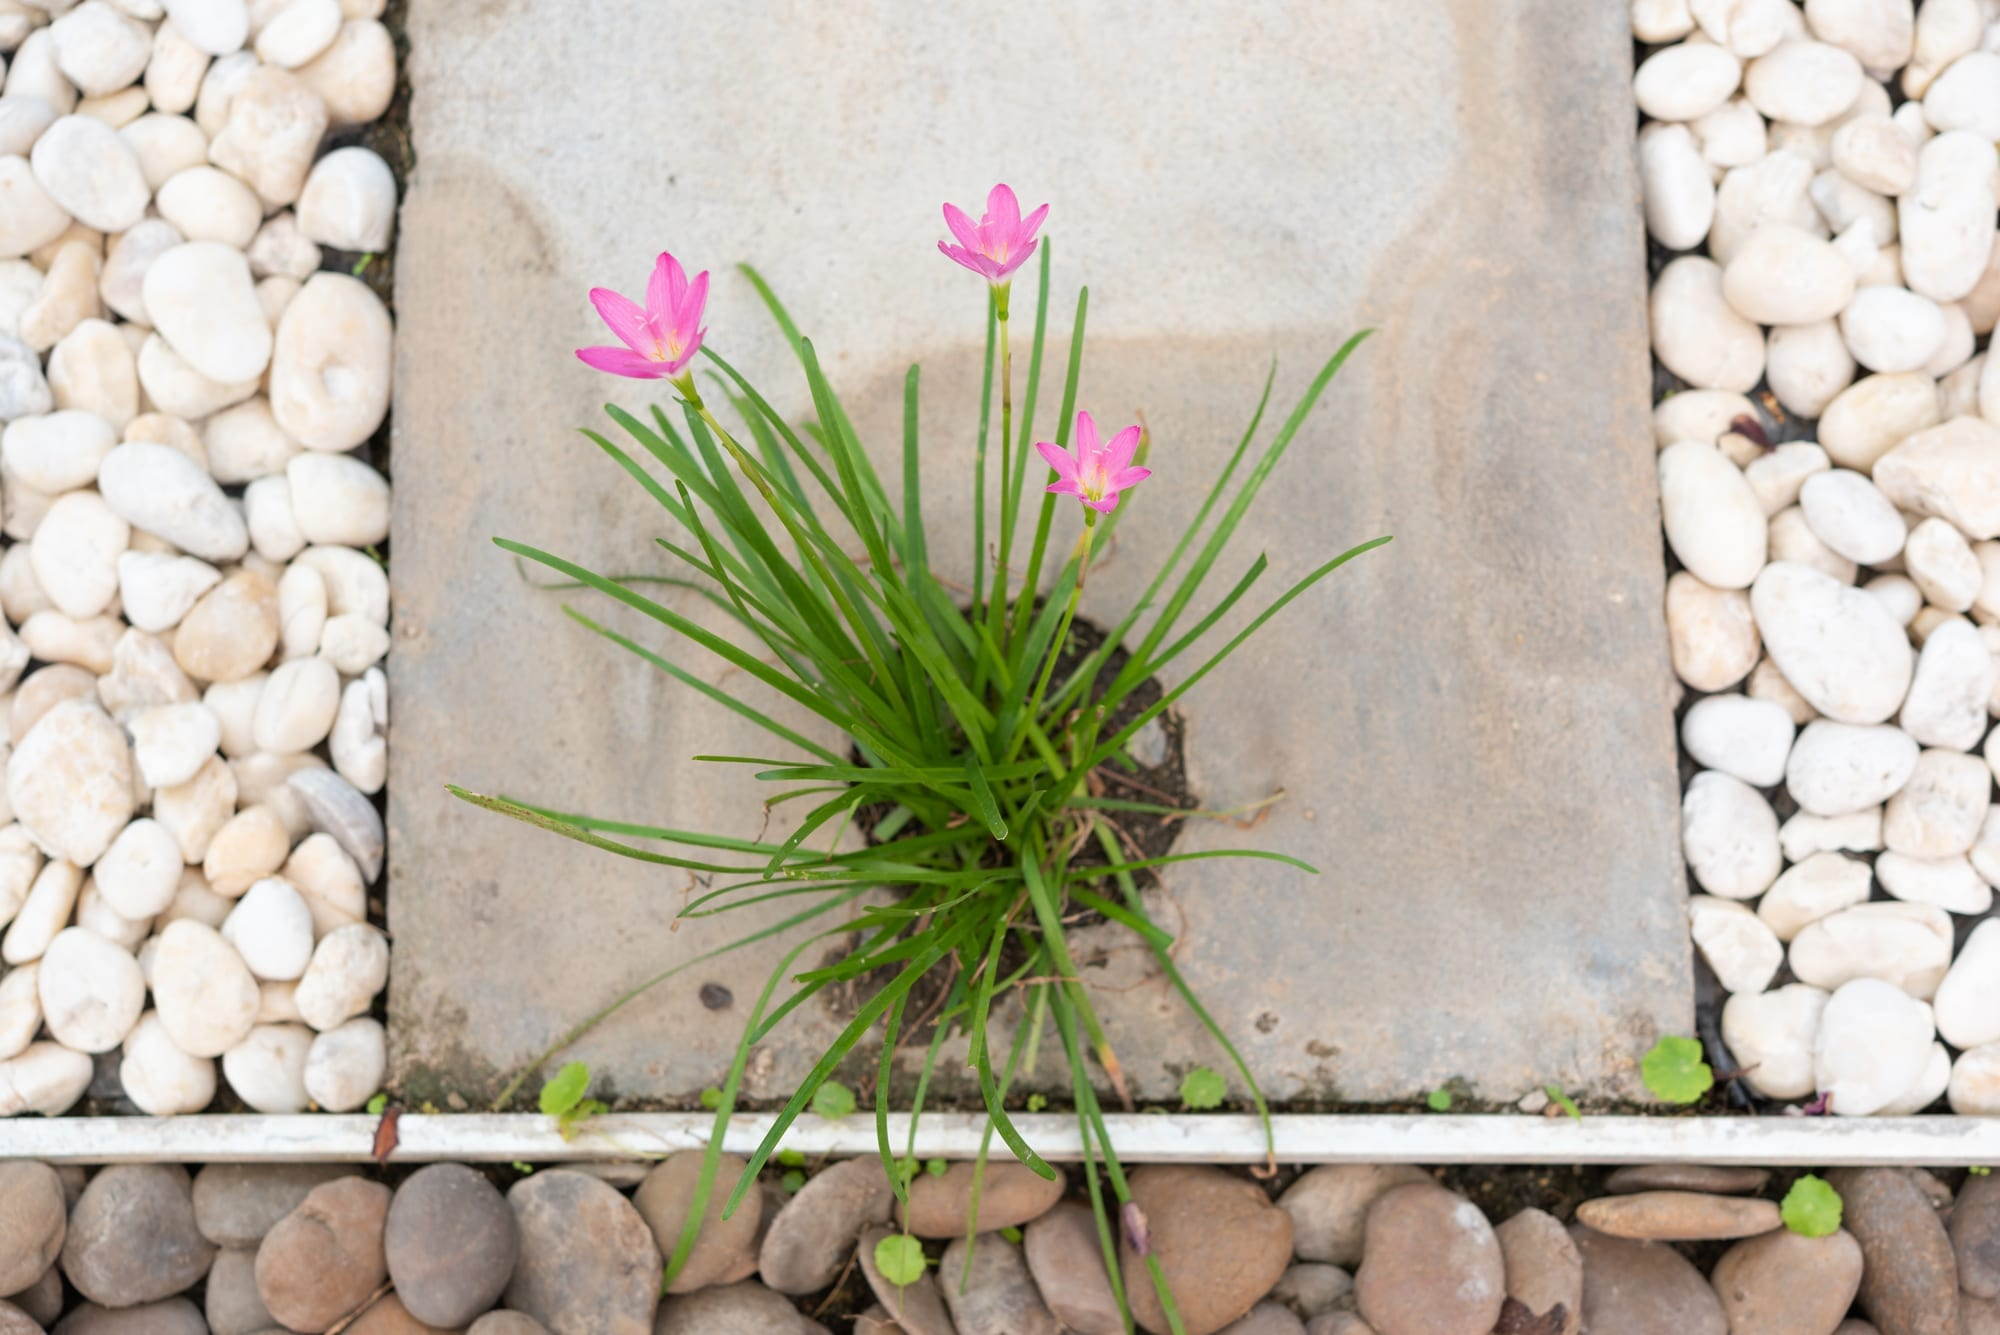 Using landscape pebbles to decorate flowers